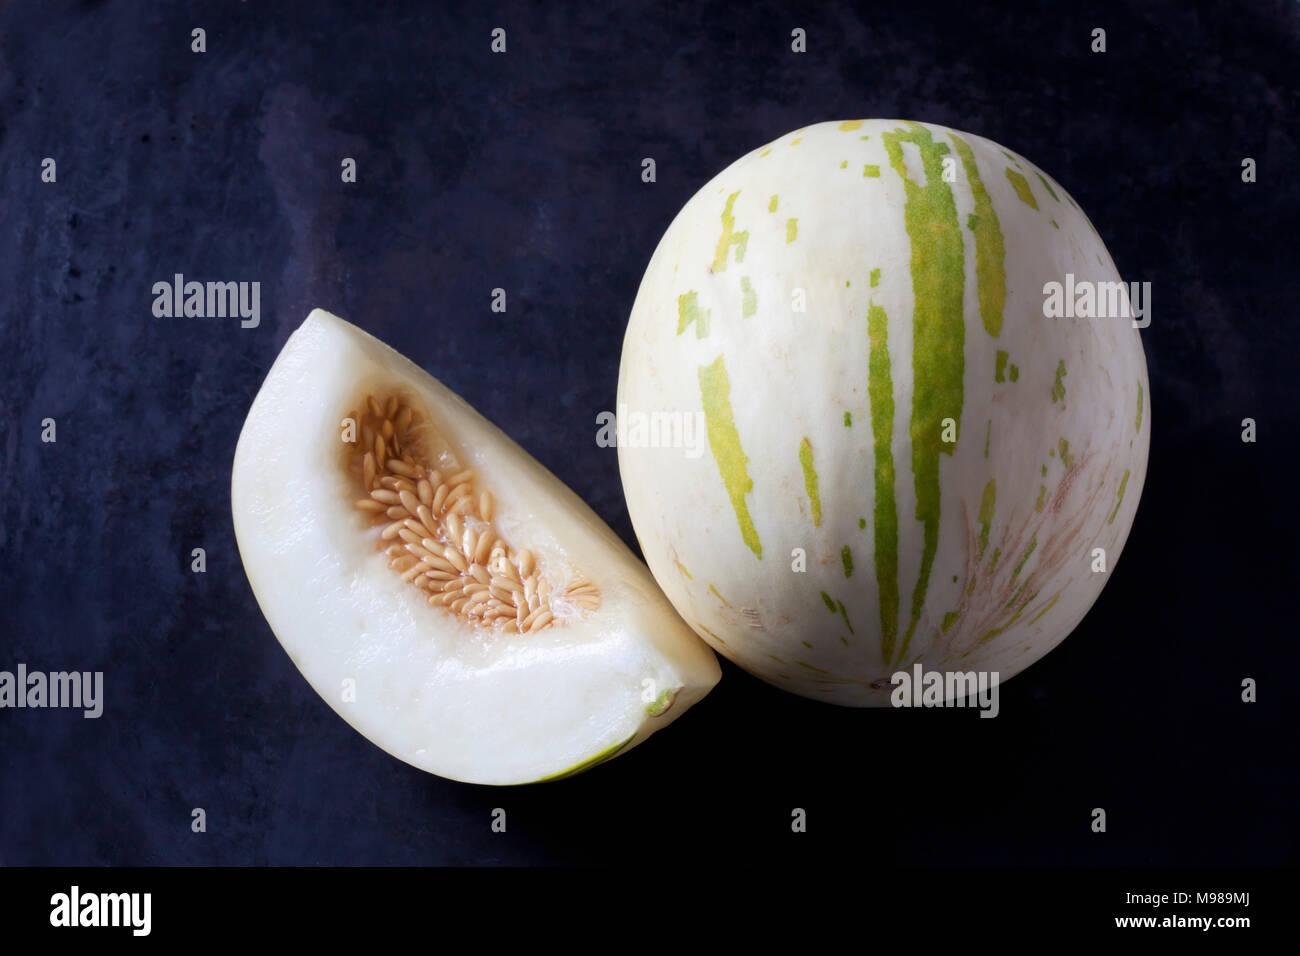 Snowball Melon on dark ground - Stock Image